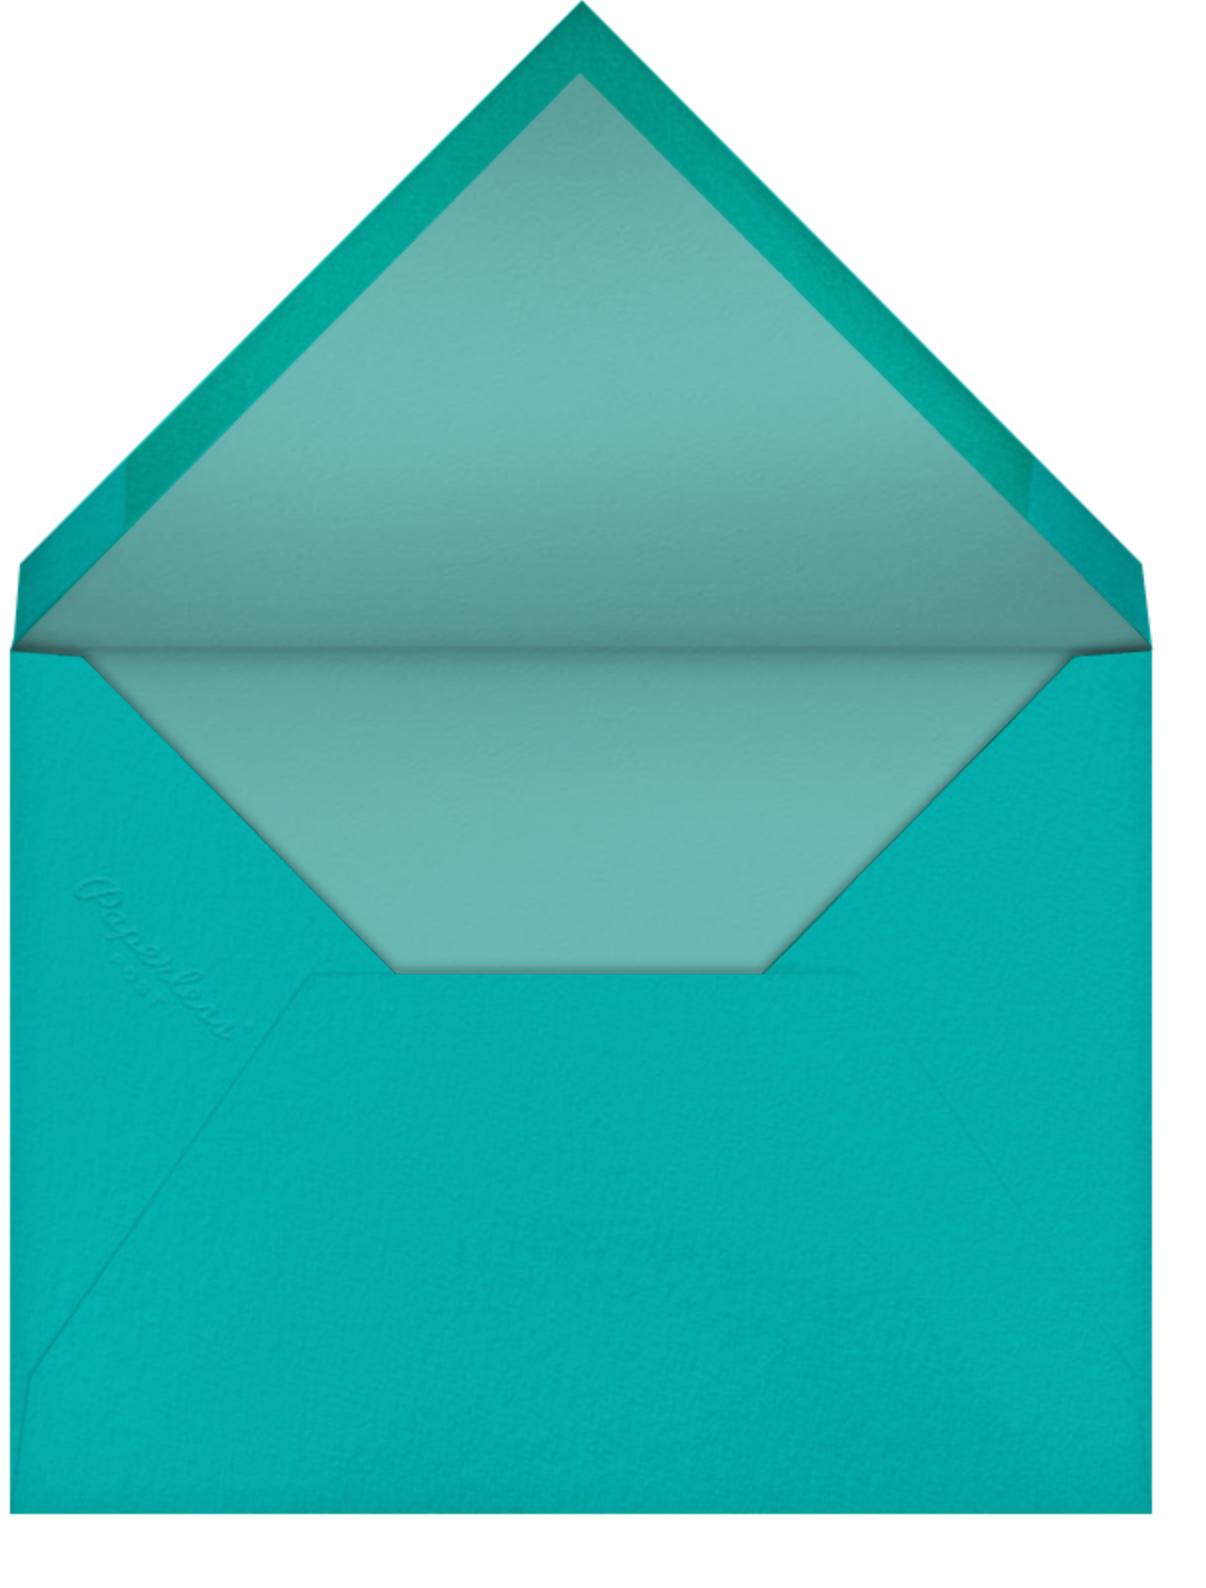 Bird Balloon (Invitation) - Blue - Petit Collage - Baby shower - envelope back